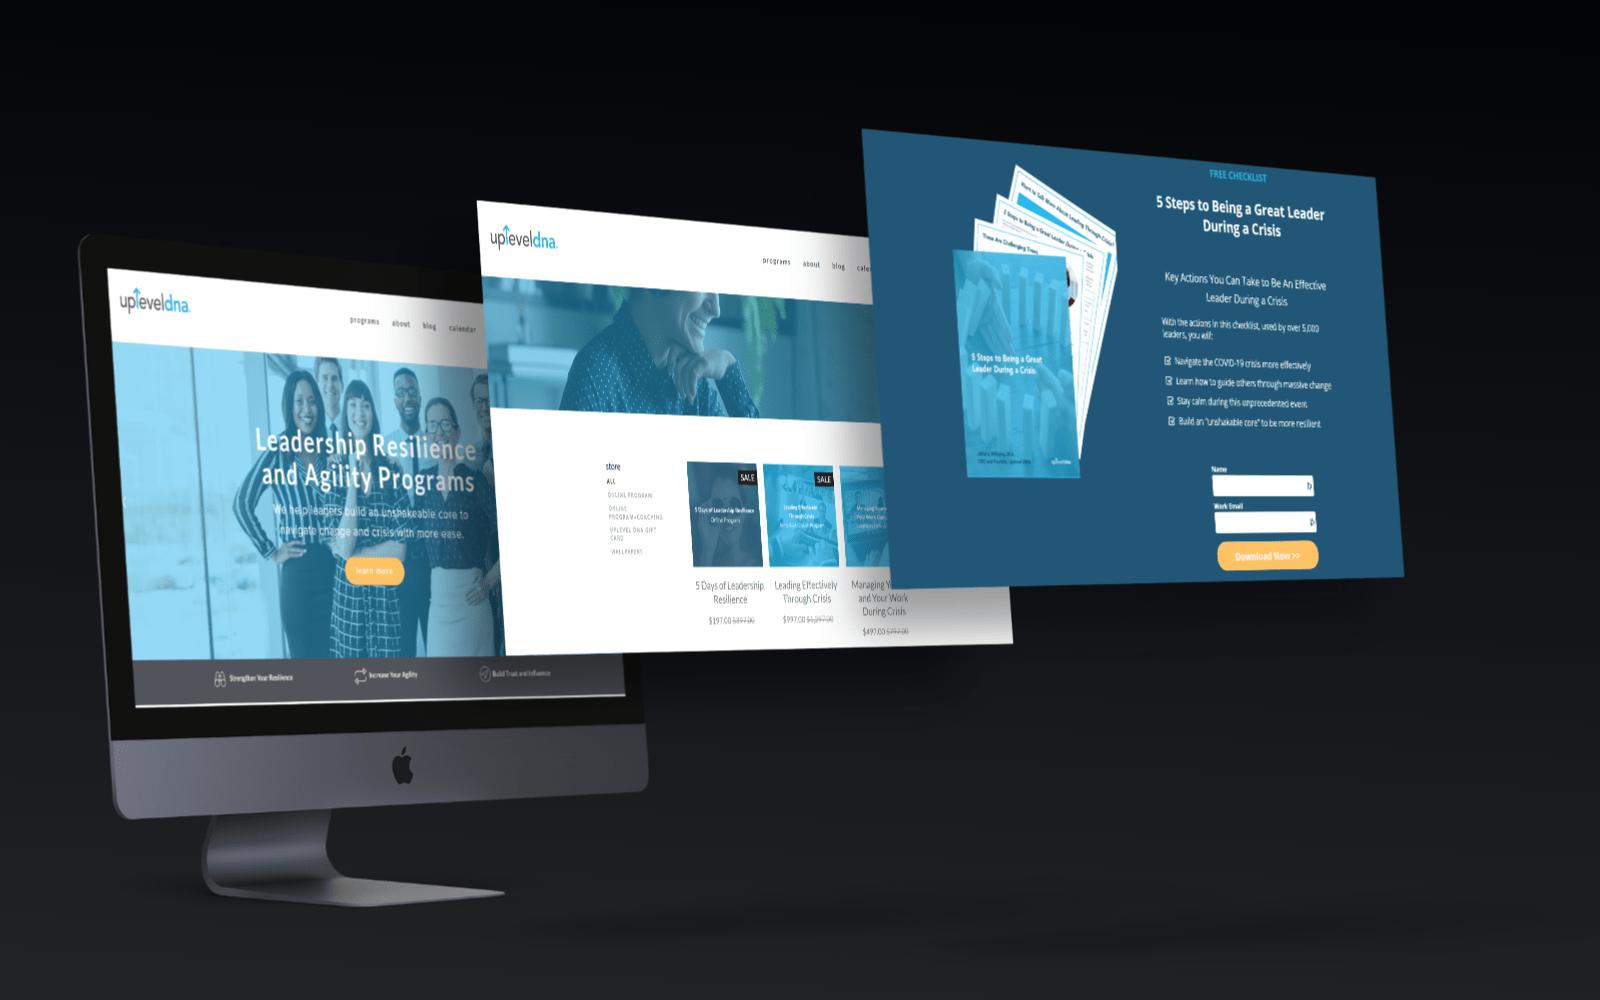 upleveldna website and marketing automation services